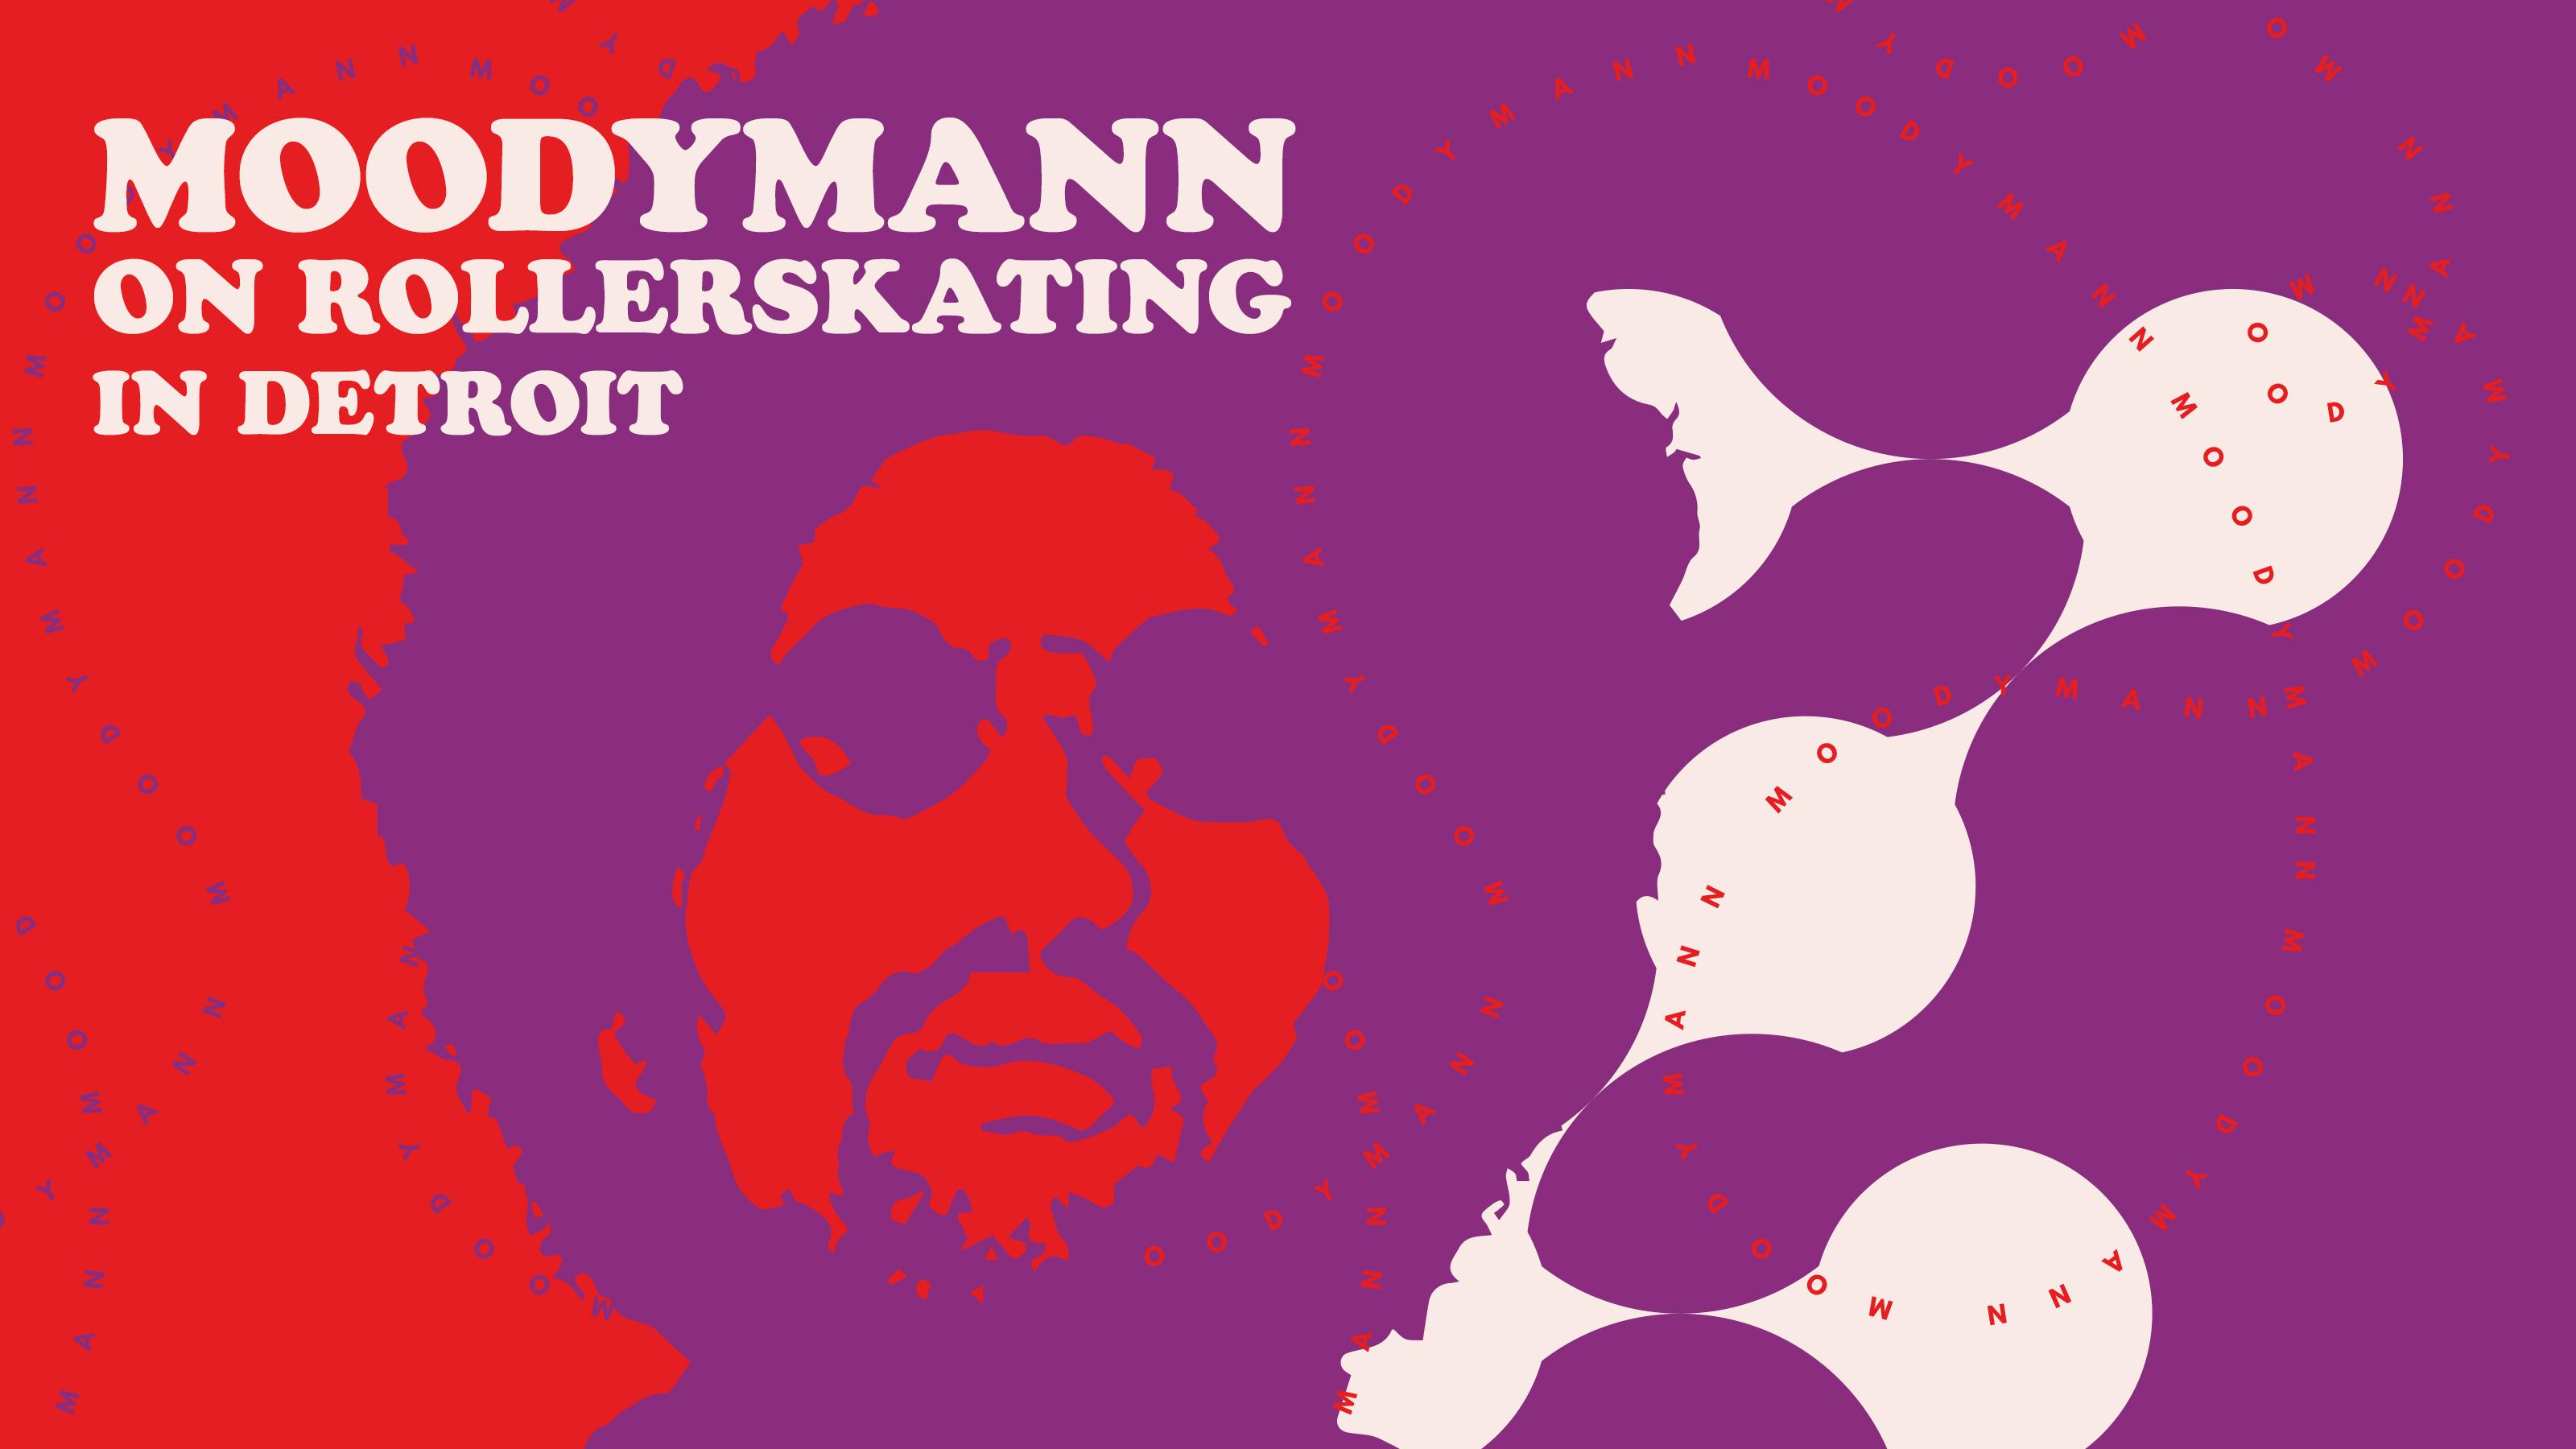 Moodymannが語るデトロイトのローラースケート・シーン